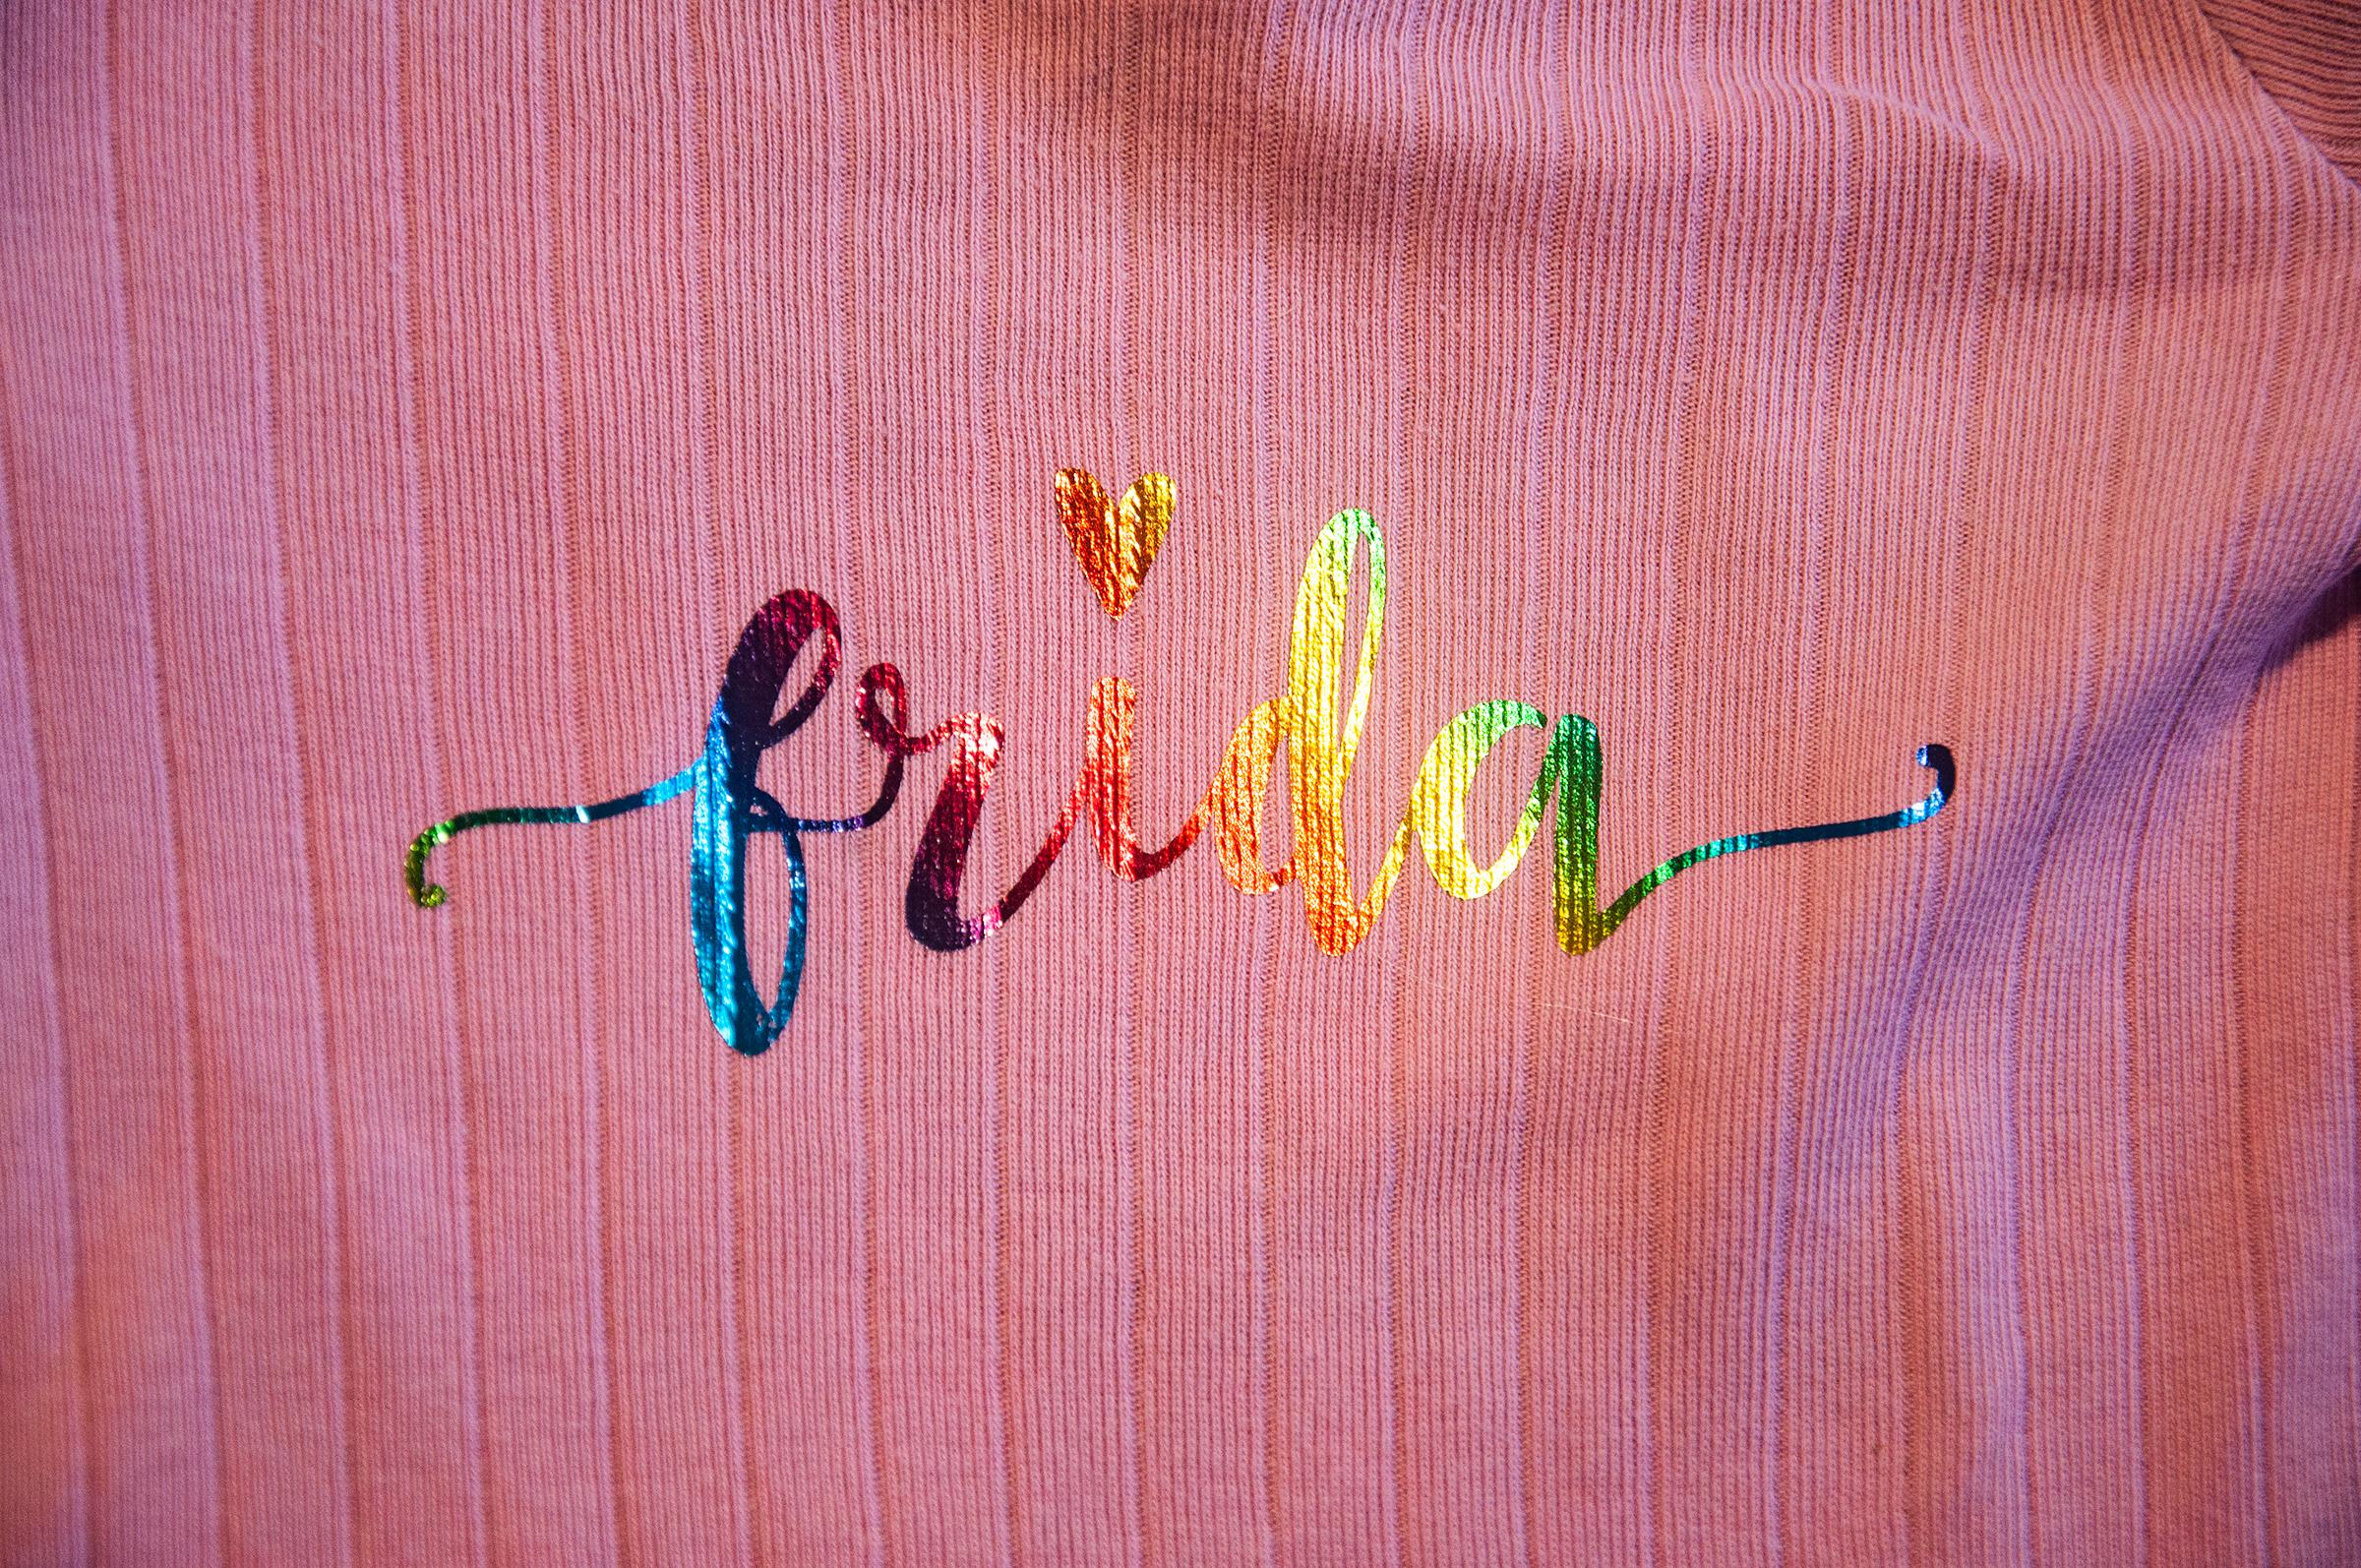 Navn i regnbuefolie